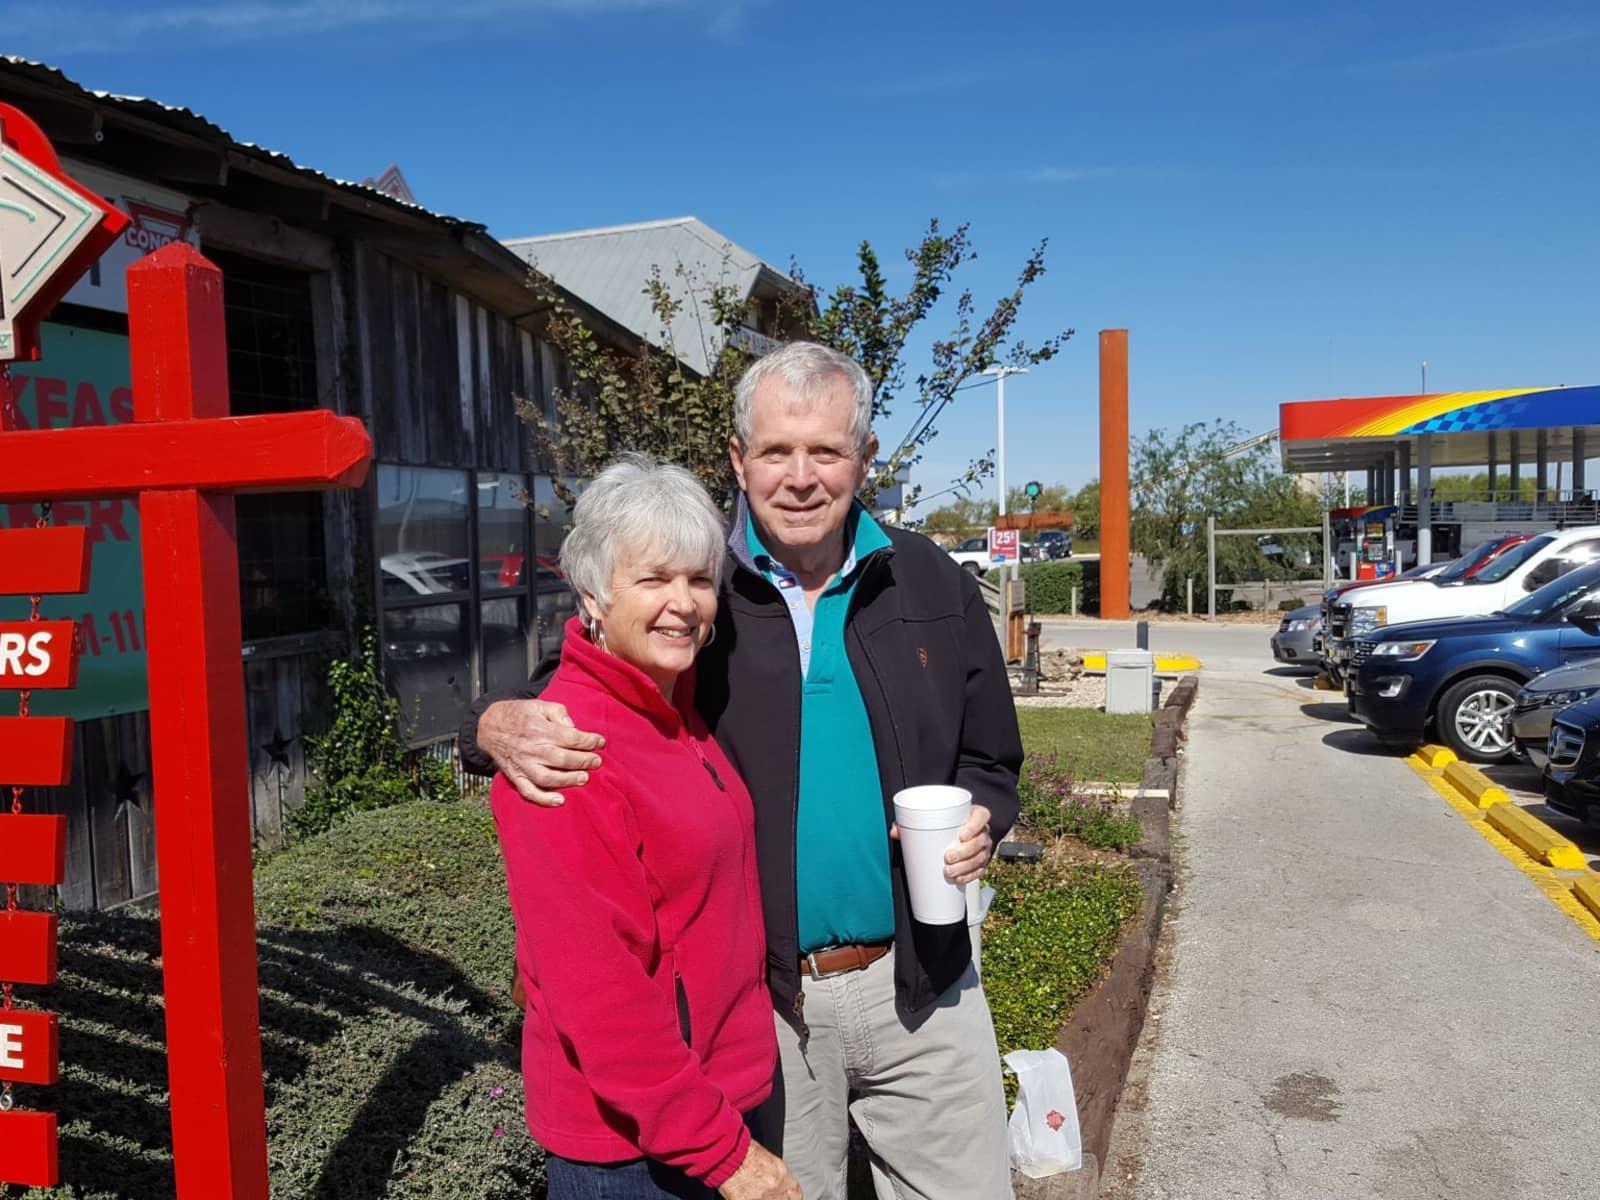 Robert & Joan from Cumming, Georgia, United States